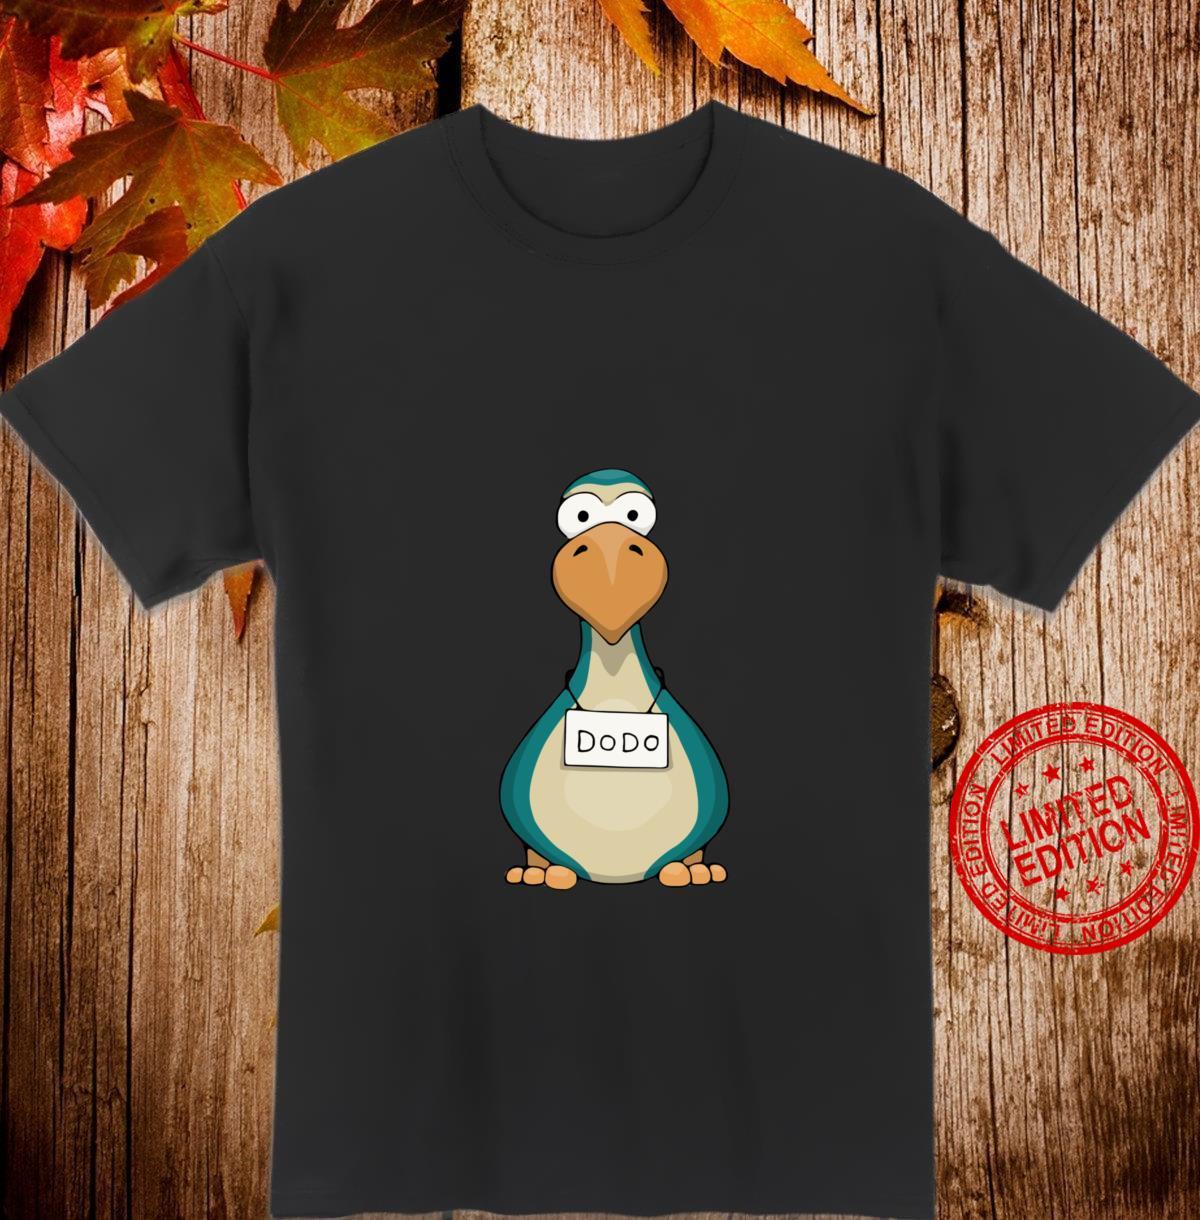 Lustiger Comic Vogel als Fahndungsfoto Dodo Shirt